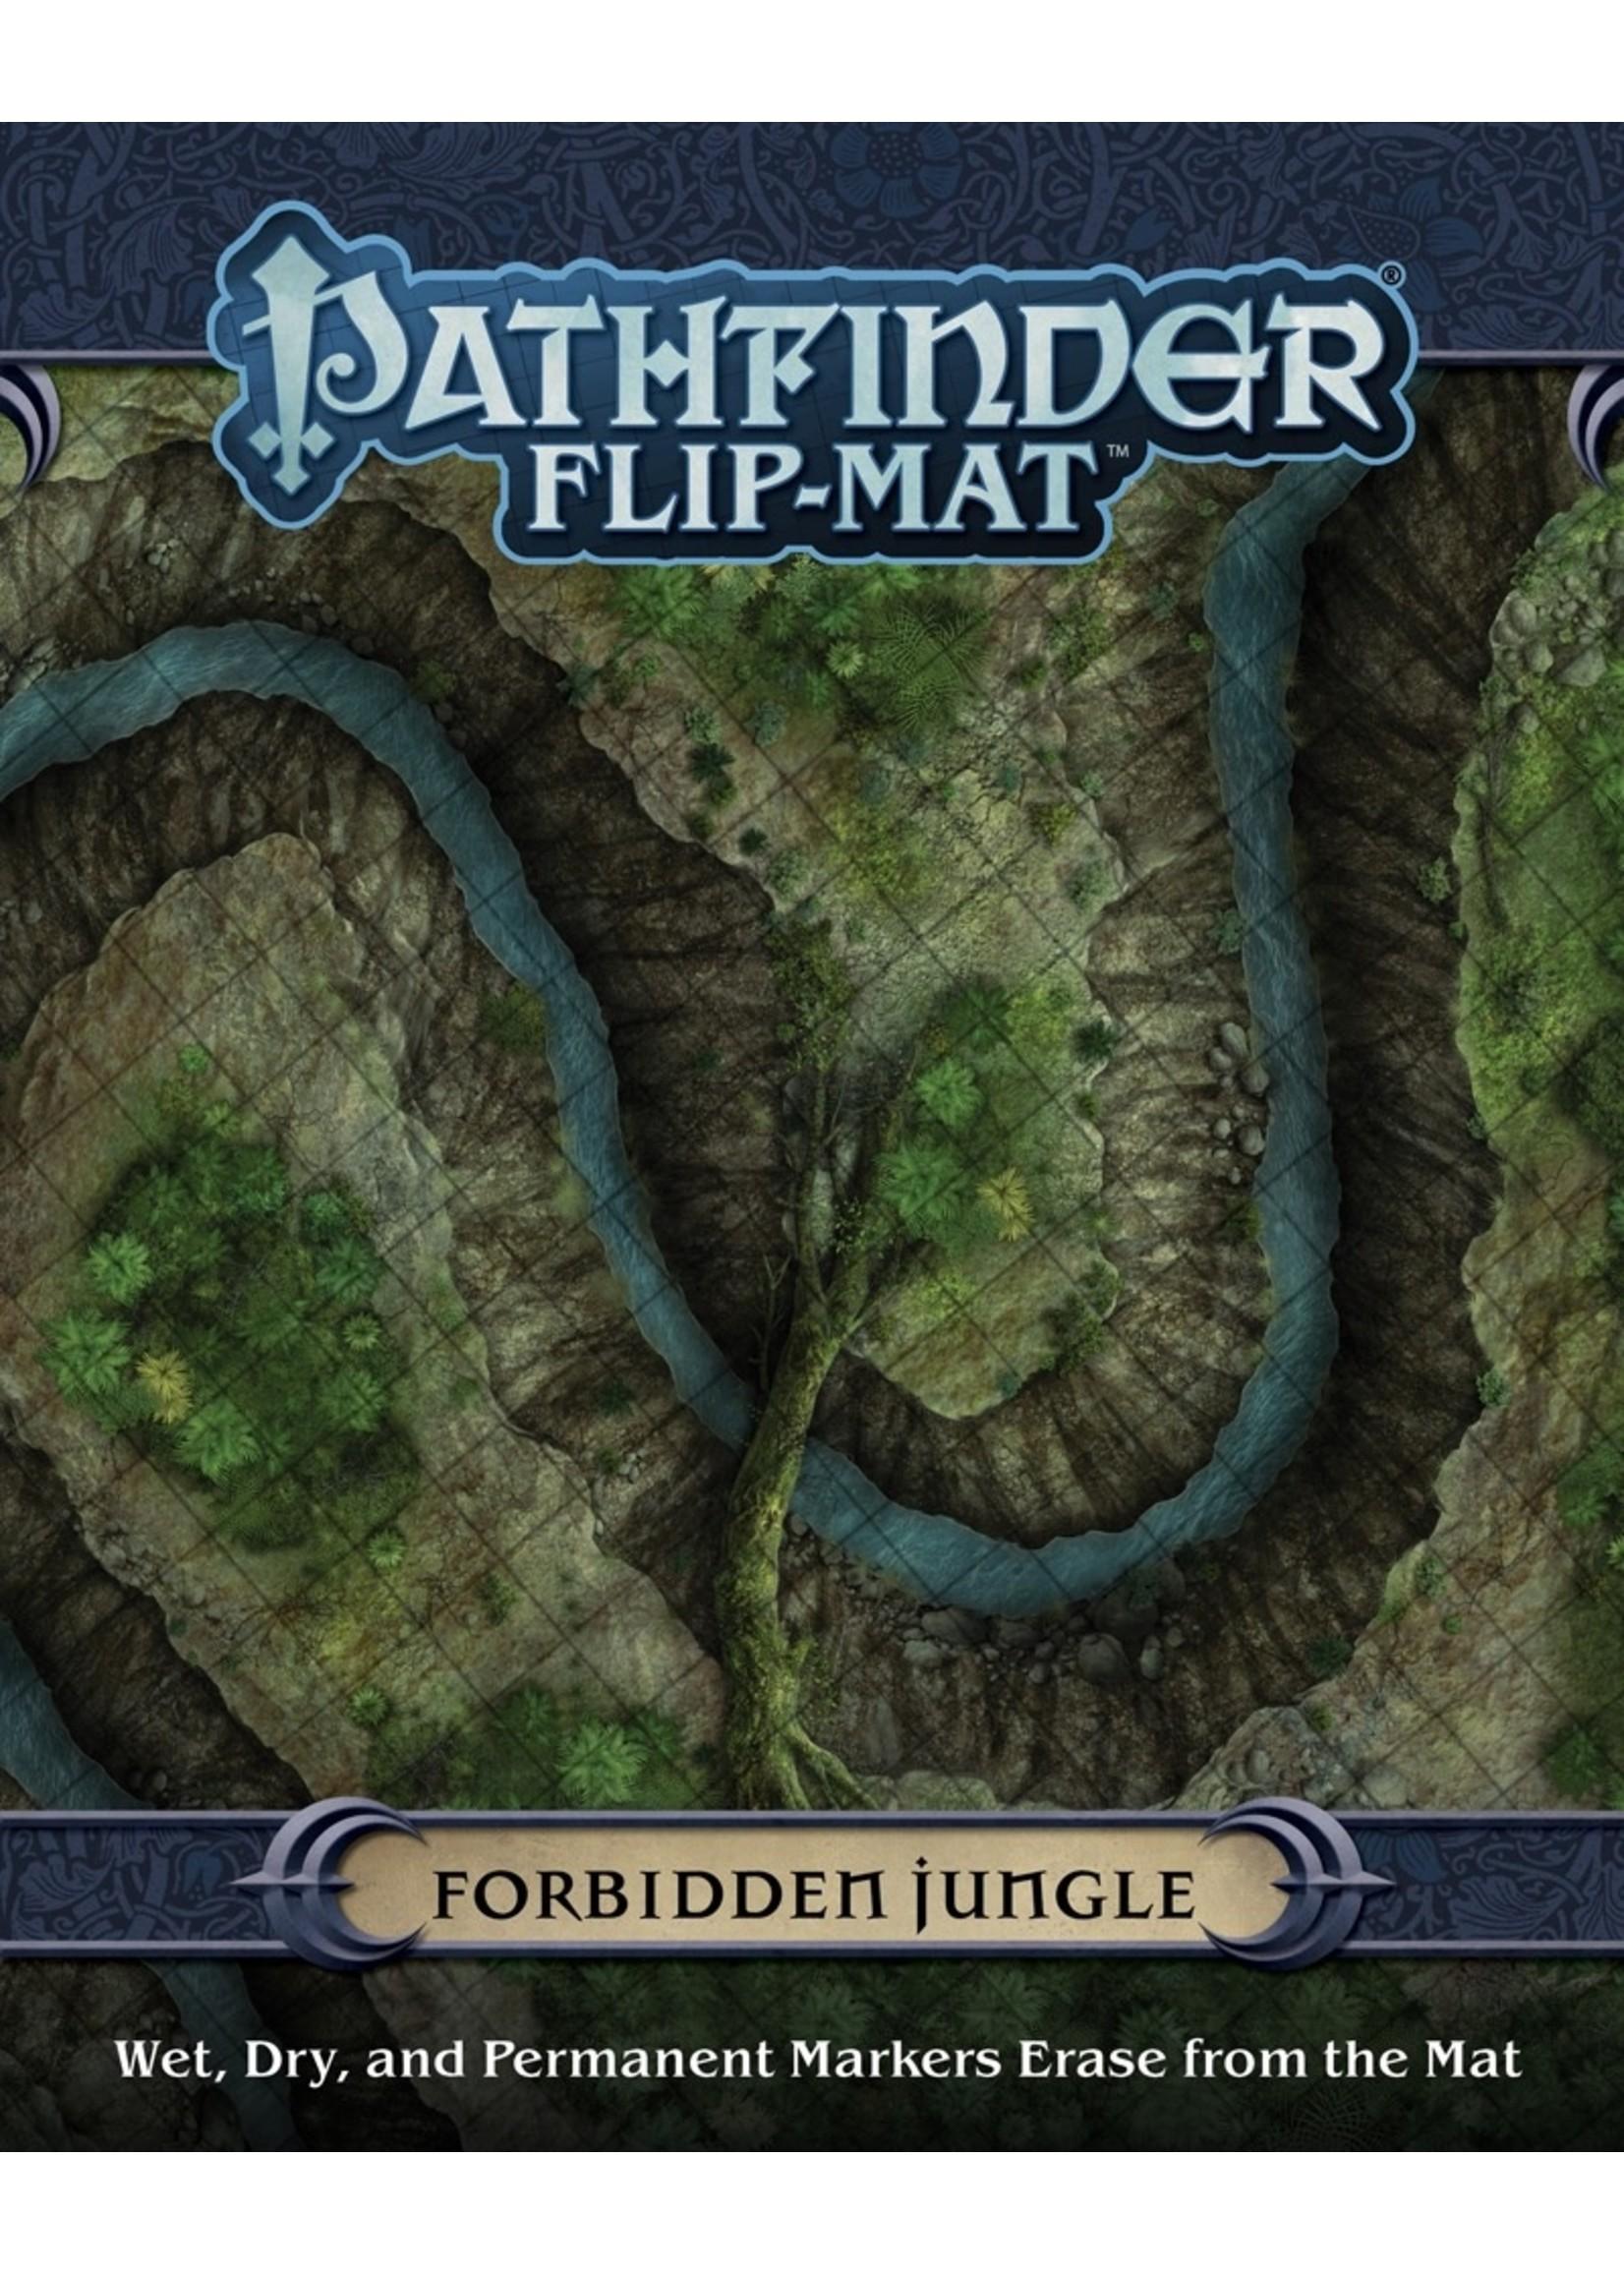 Pathfinder RPG: Flip-Mat - Forbidden Jungle